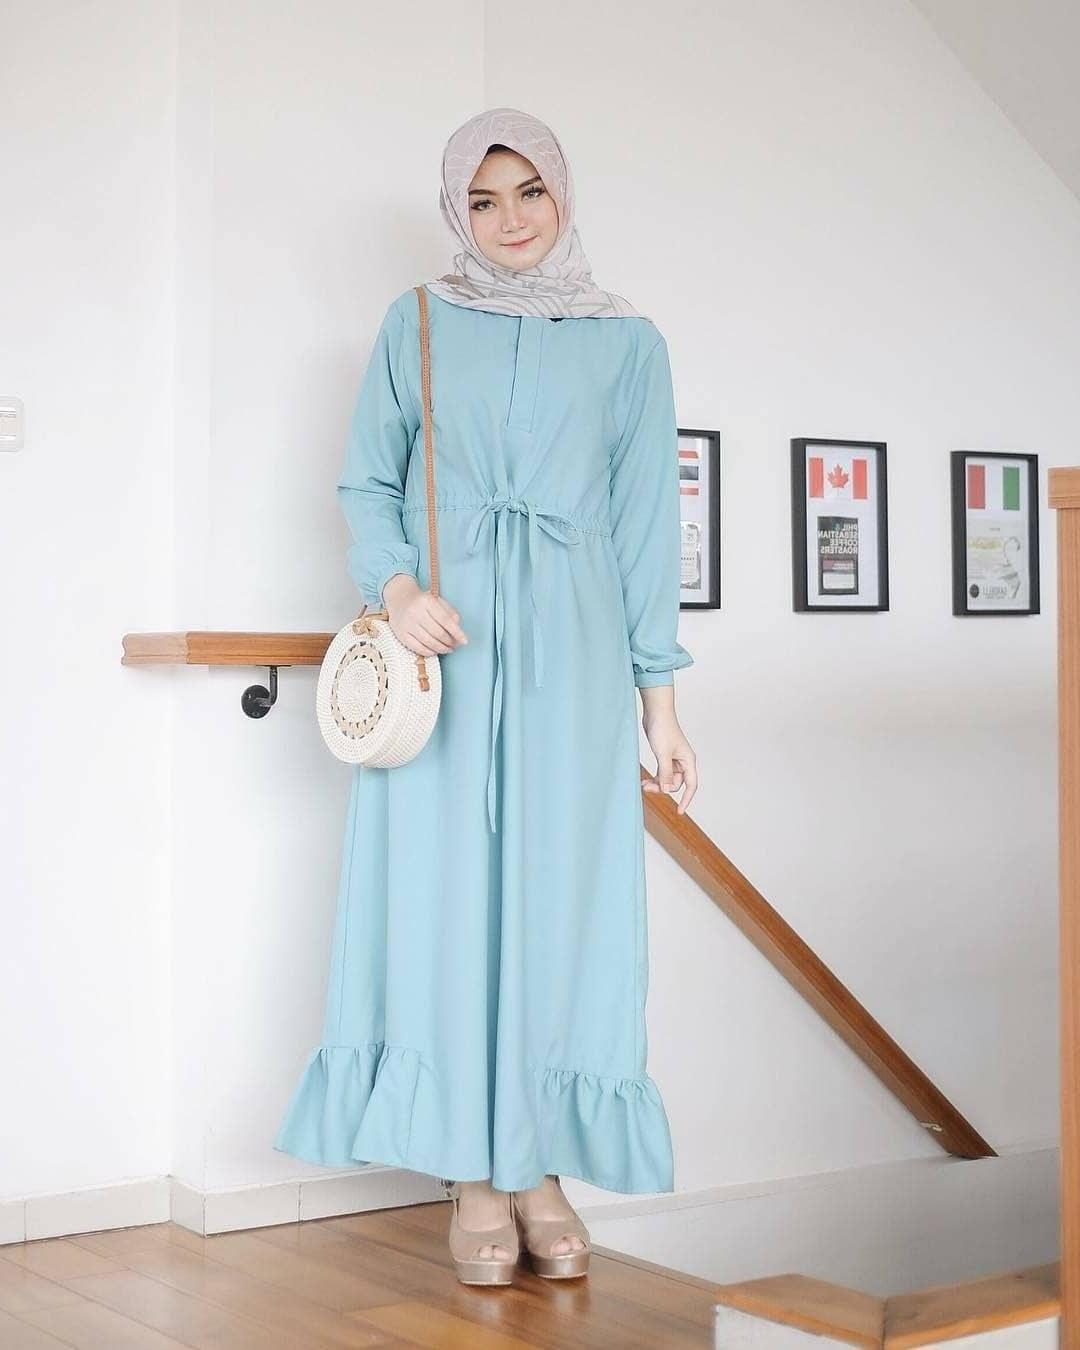 Design Model Baju Lebaran 2018 Anak Perempuan Budm Tren Busana Muslim Terbaru Untuk Merayakan Hari Raya Yang